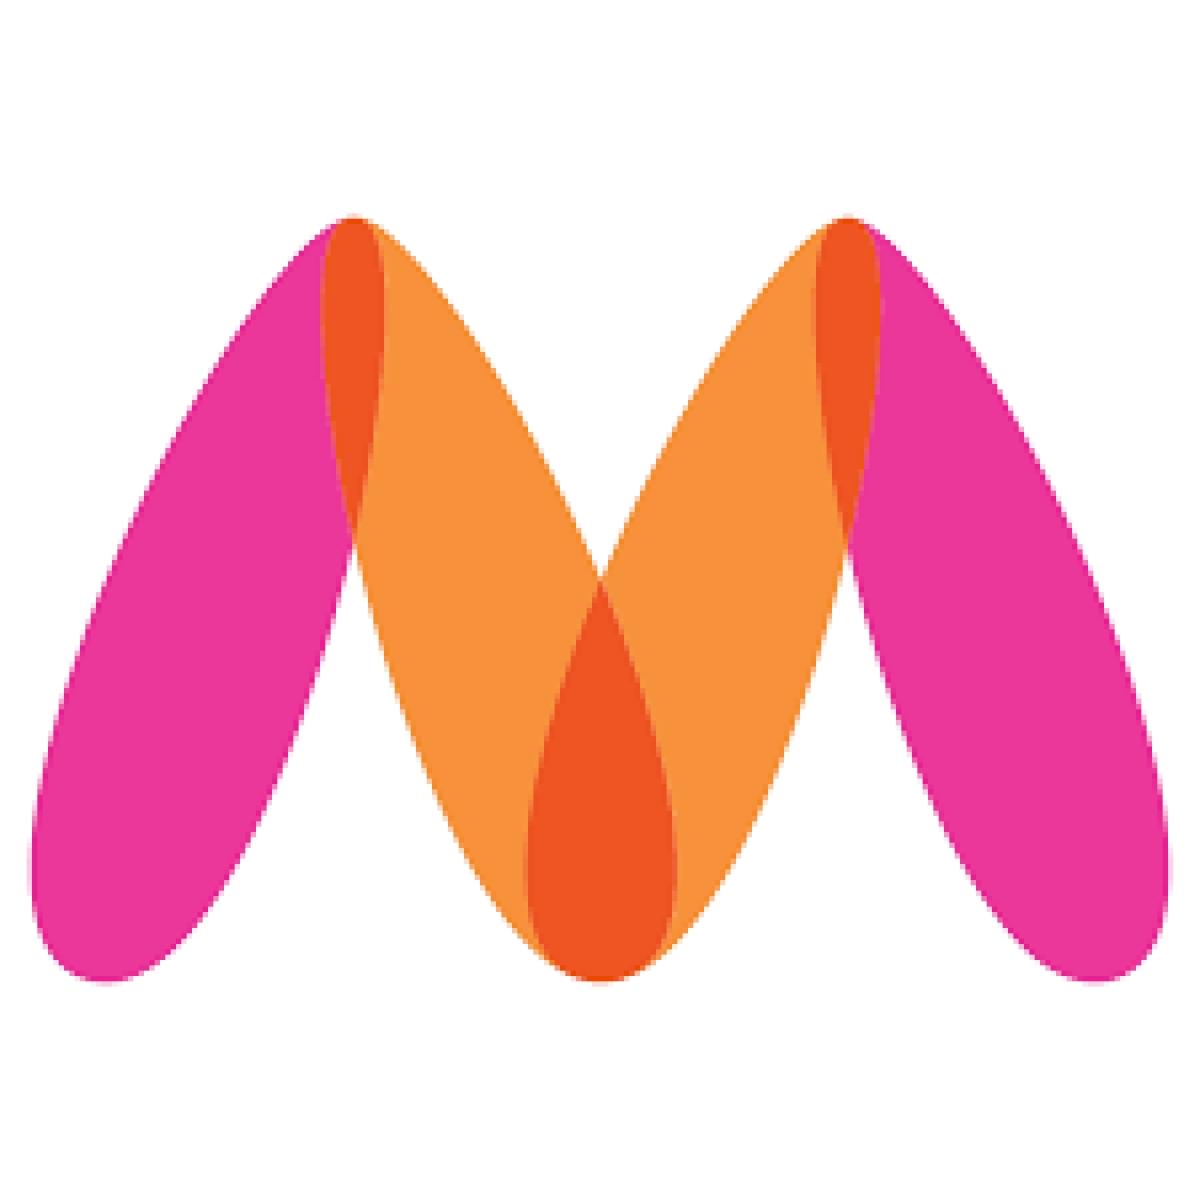 Myntra's old logo